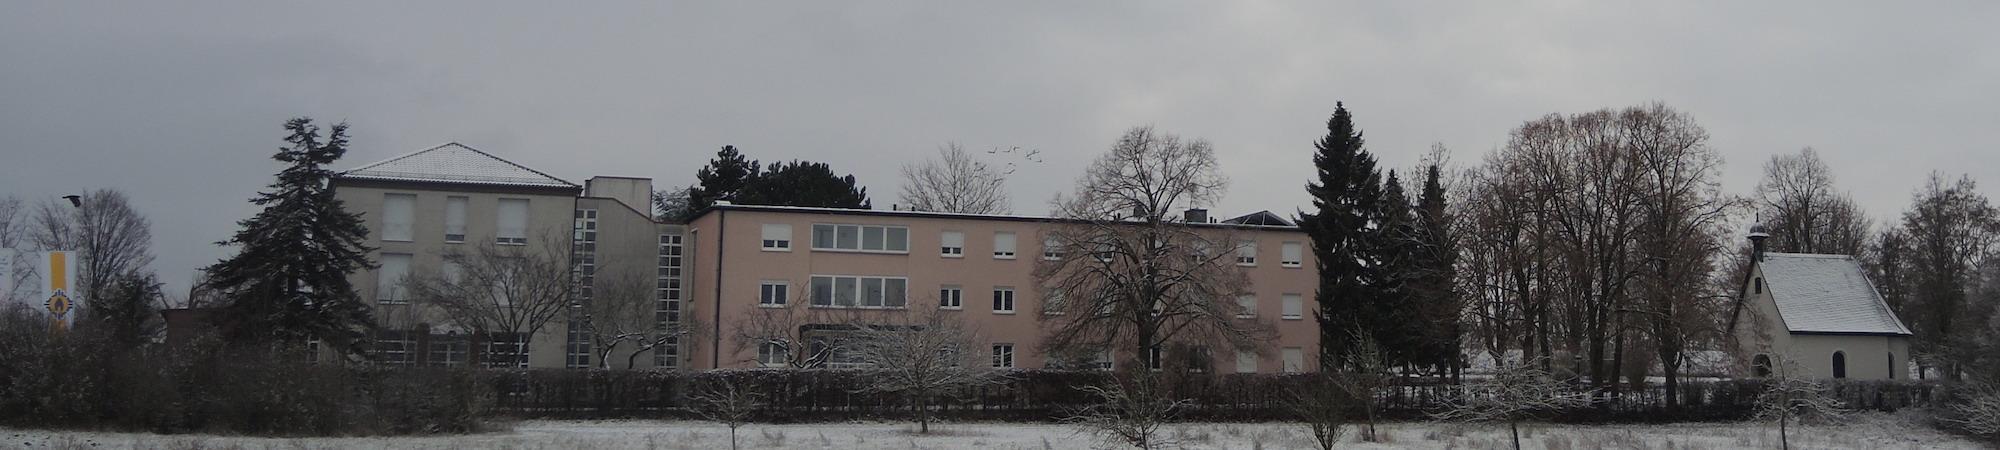 Marienhoehe_Januar 2021